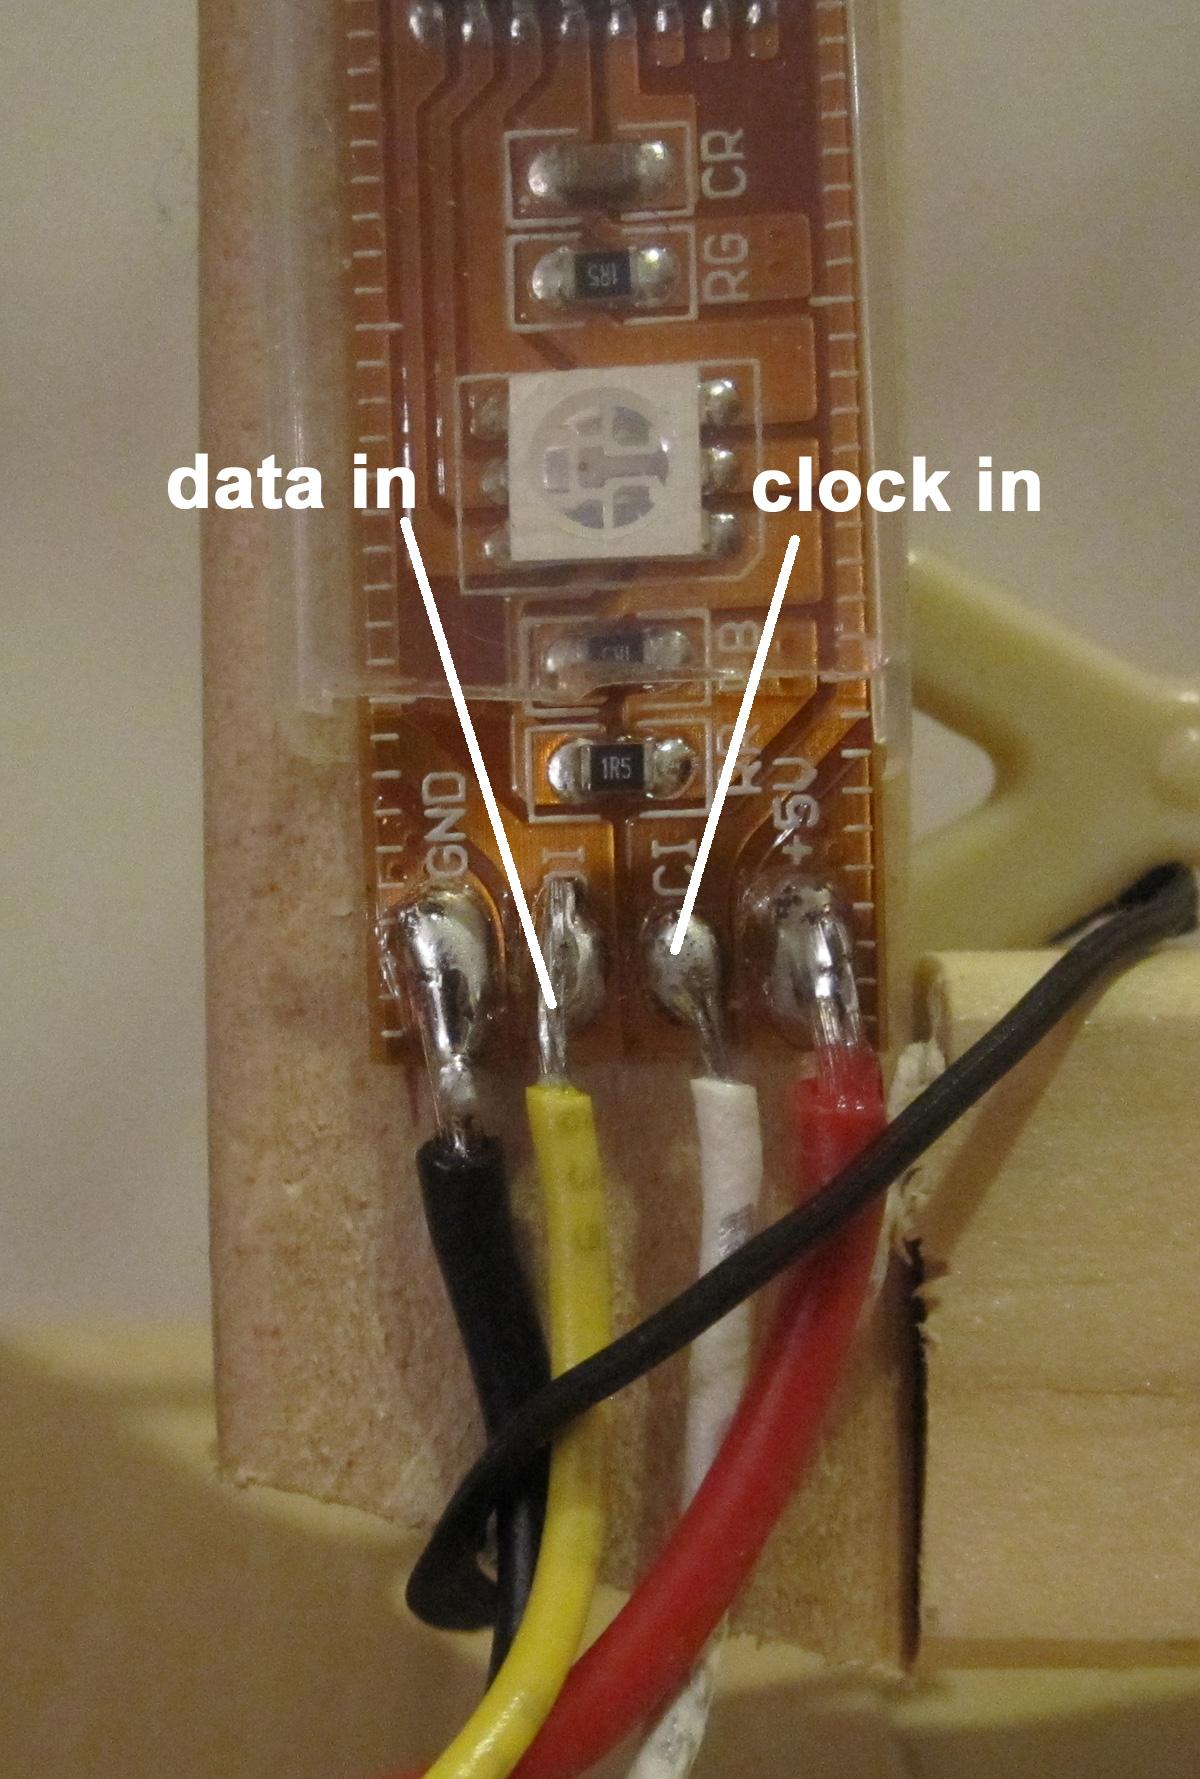 raspberry_pi_RGB_LED_strip_wiring_spi_LPD8806.jpg